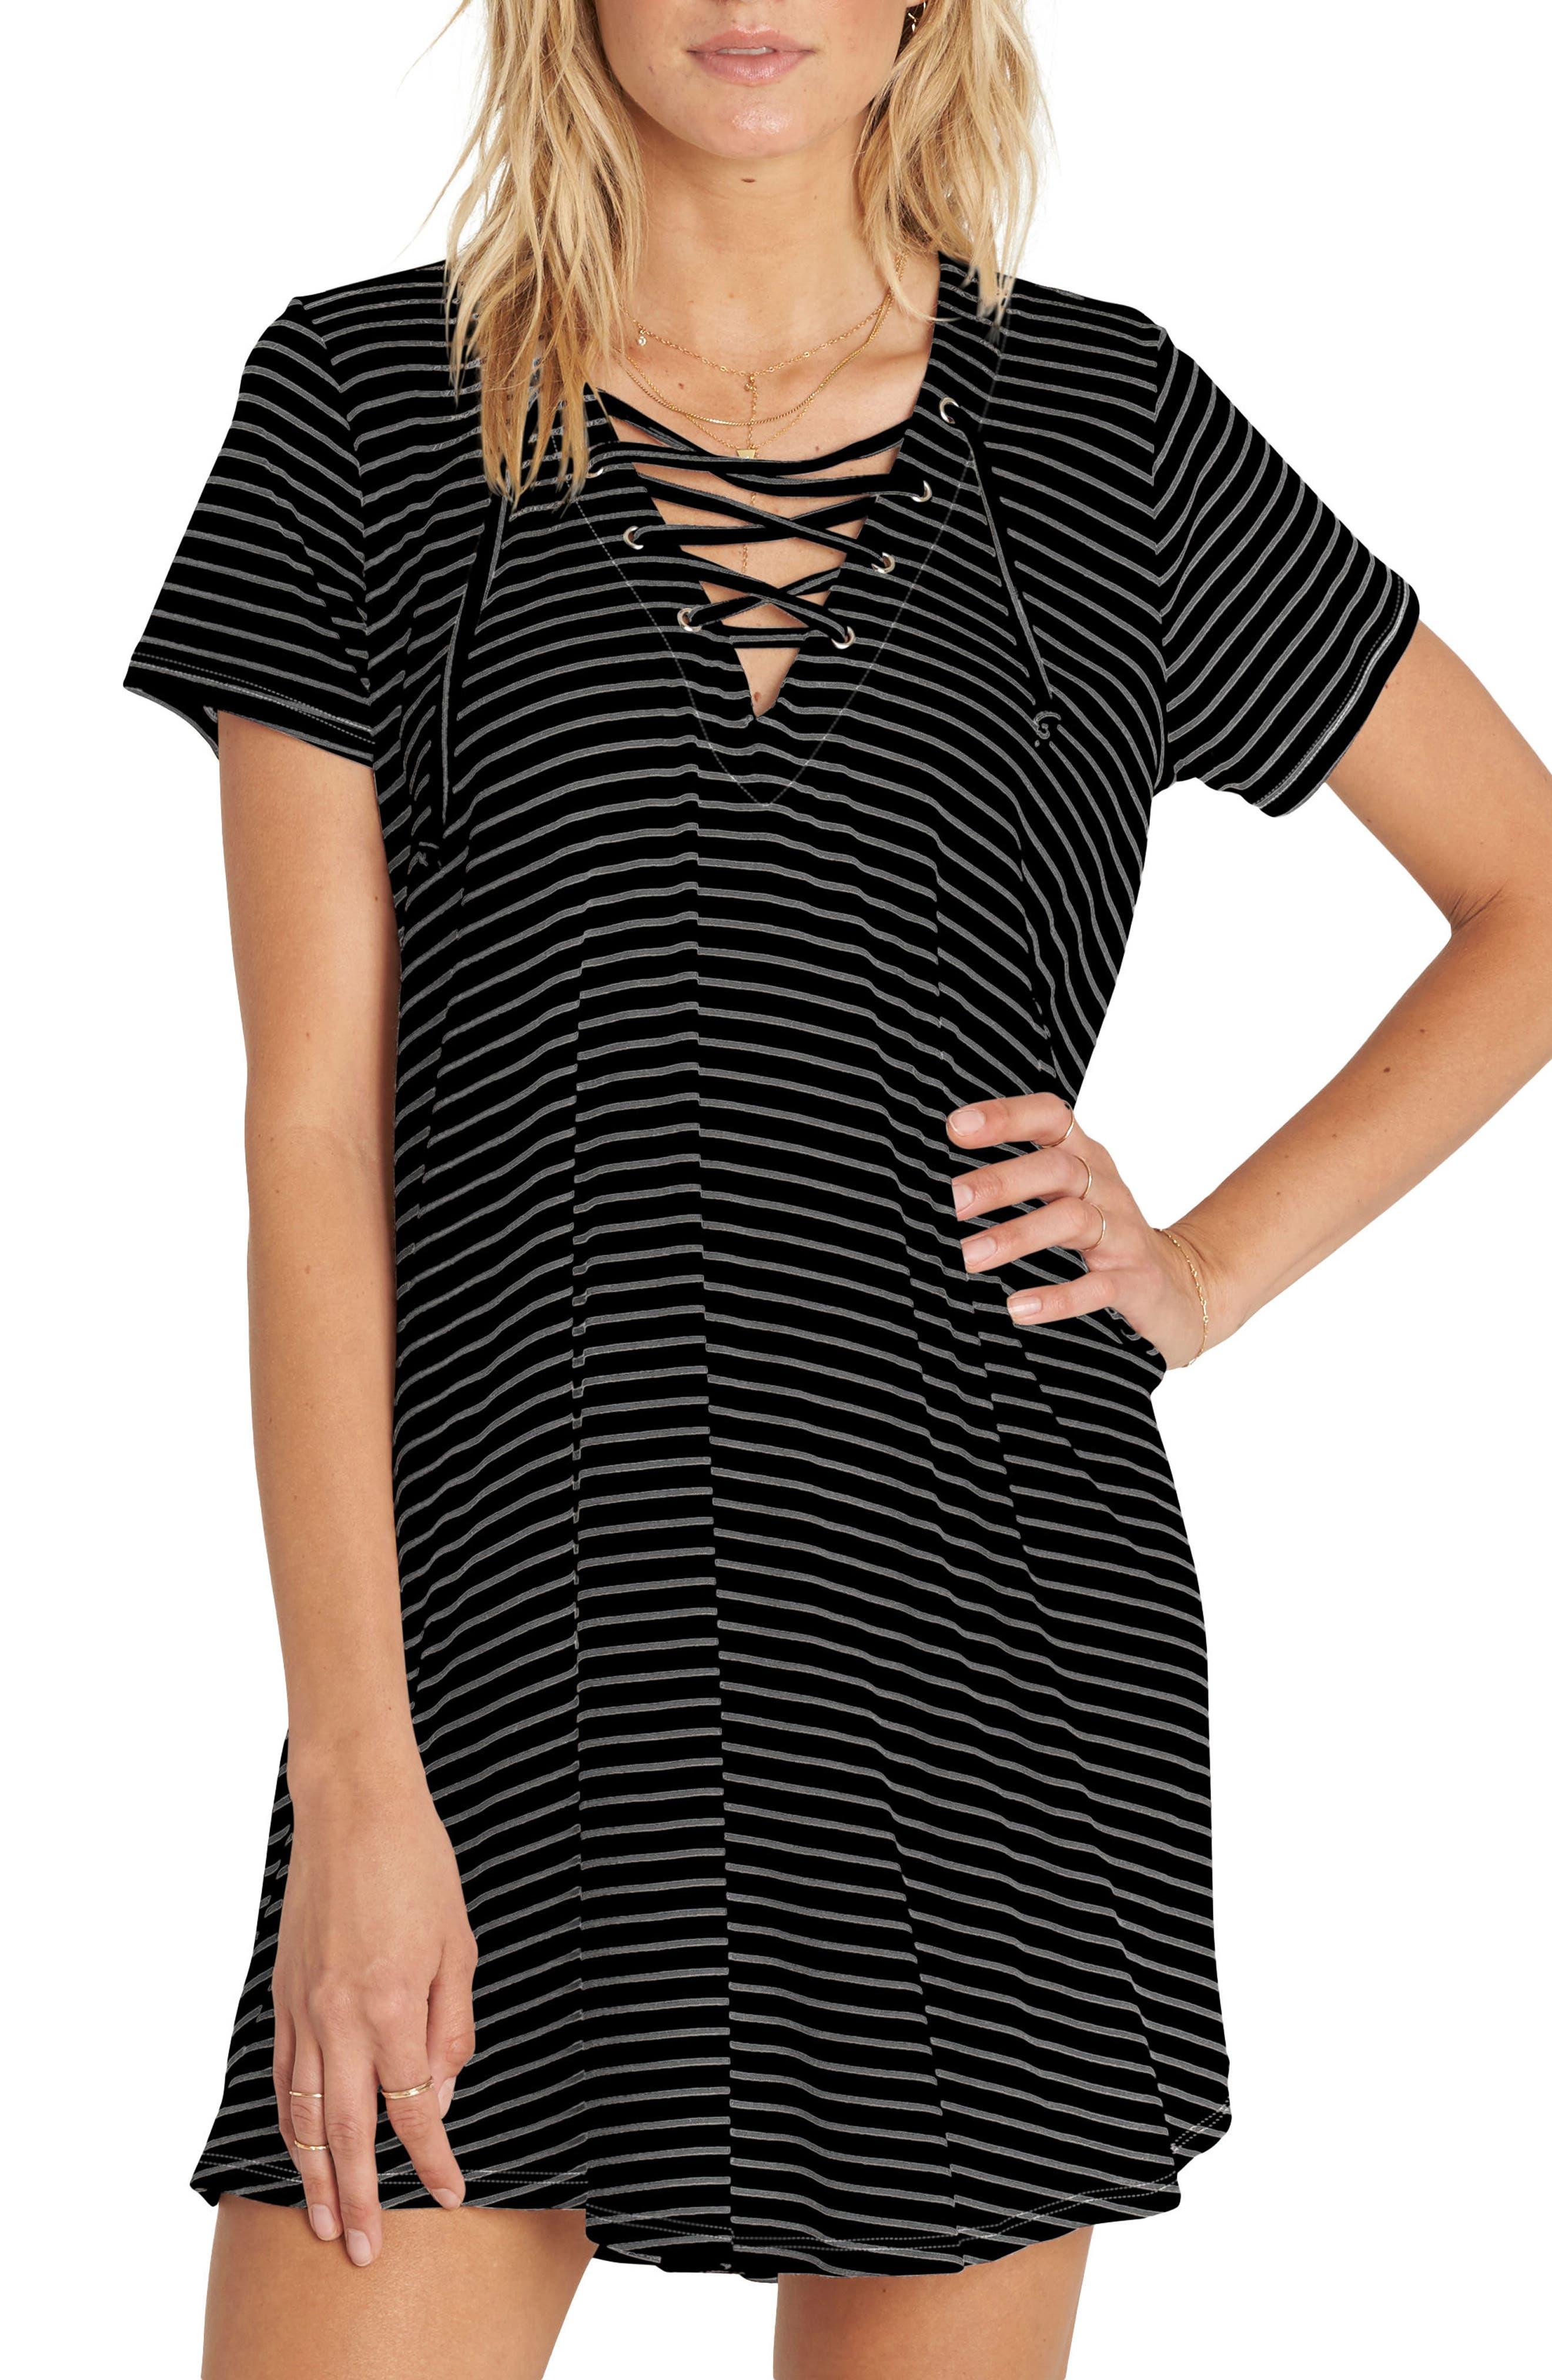 Long Ago Lace-Up T-Shirt Dress,                             Main thumbnail 1, color,                             001